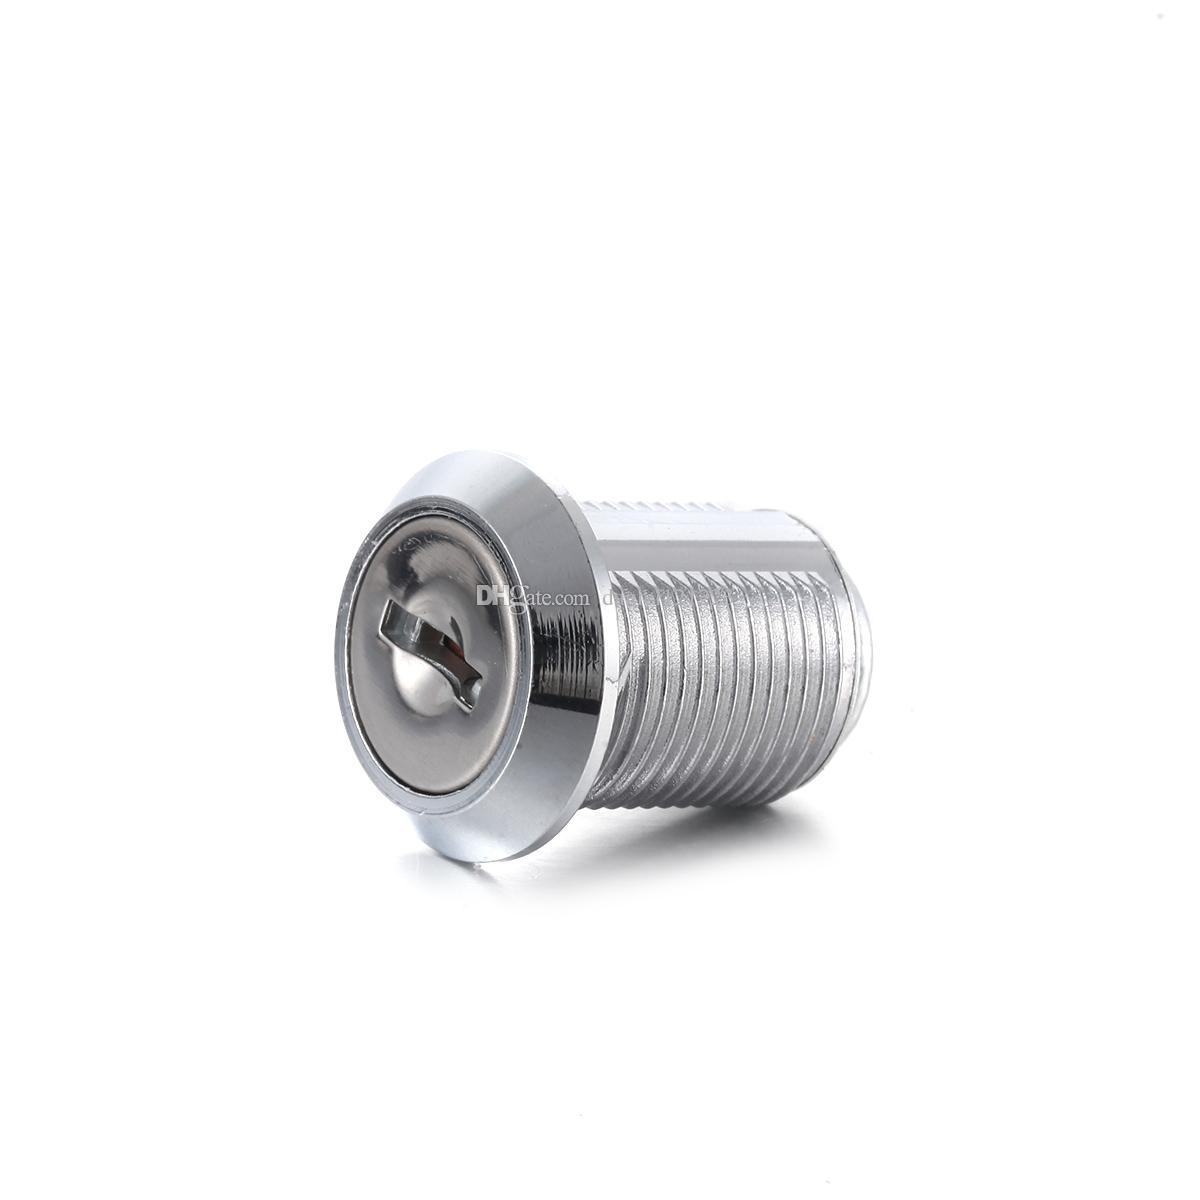 20 mm Moda Letter Box Lock Archivador Armario Armario Cilindro Lengua De Bloqueo